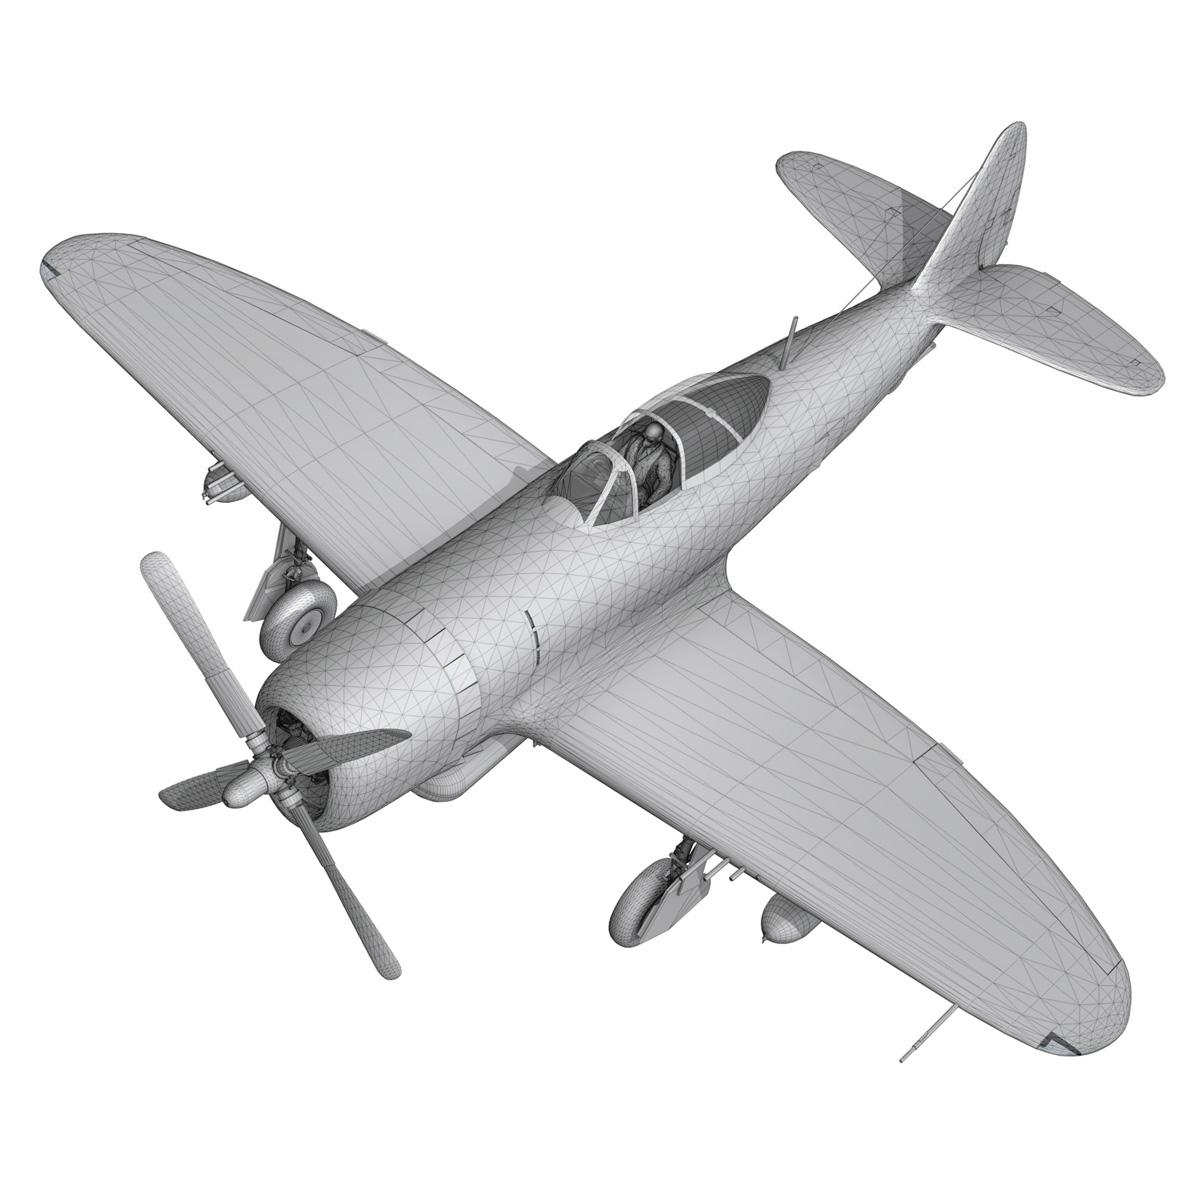 republic p-47d thunderbolt – little bunny 3d model fbx c4d lwo obj 274239